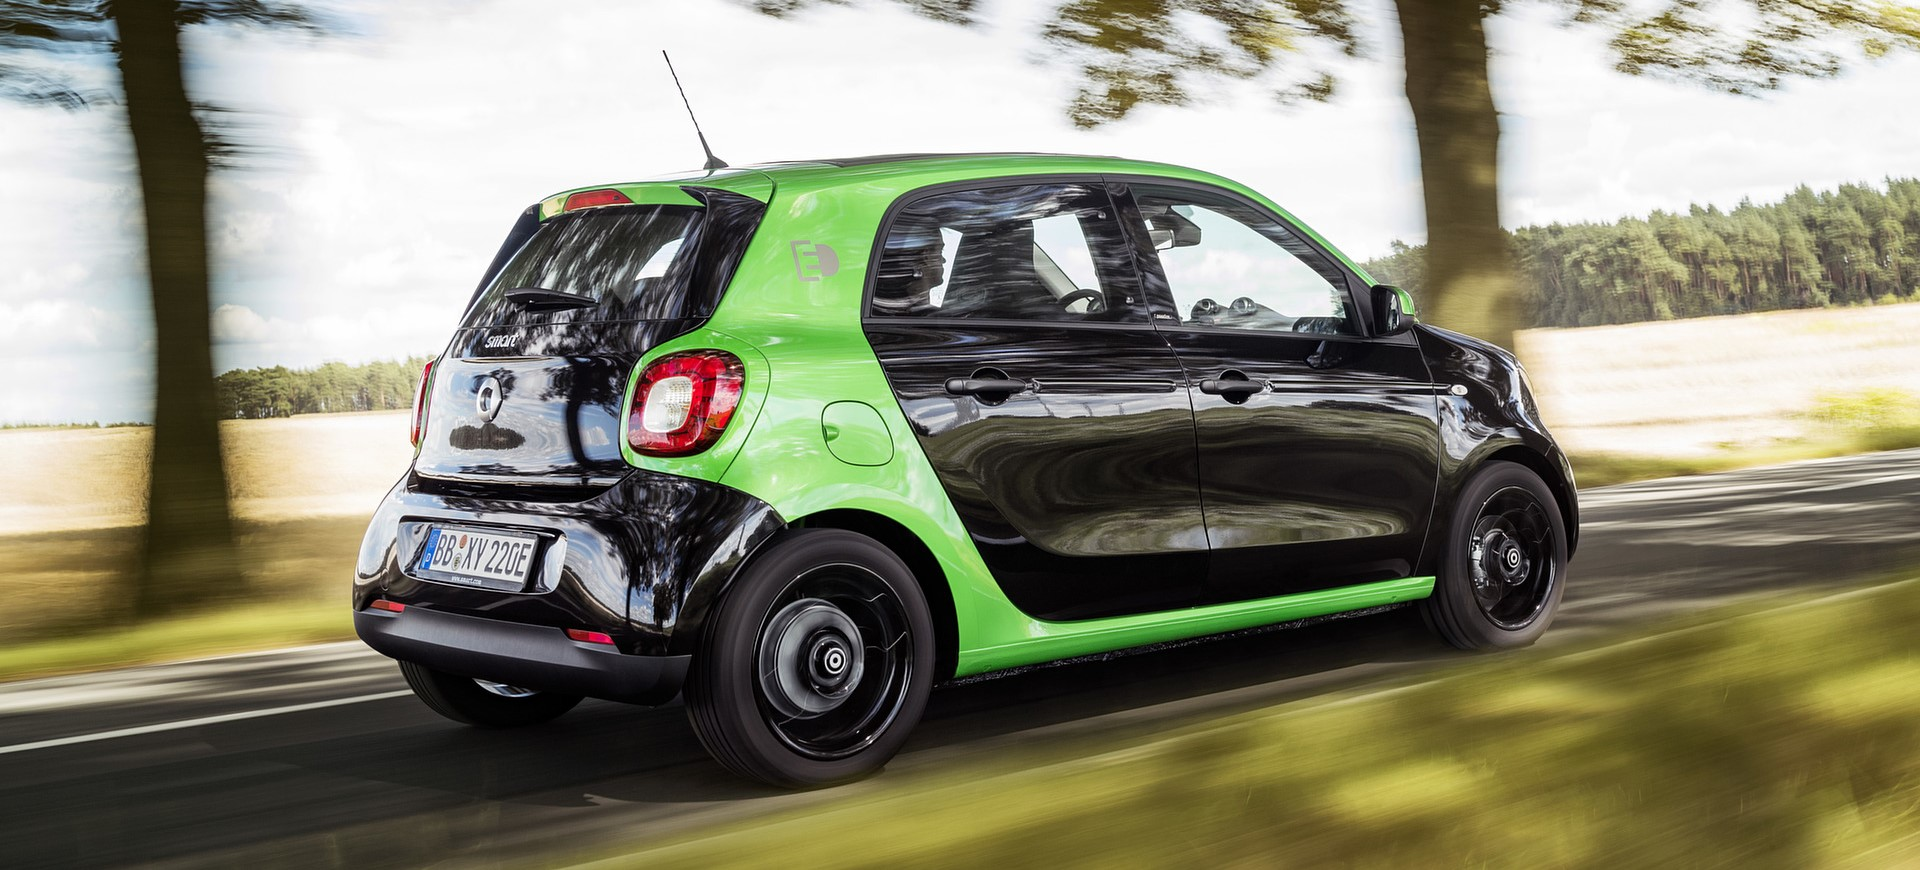 Beste laadpaal voor Smart ForFour Electric Drive?